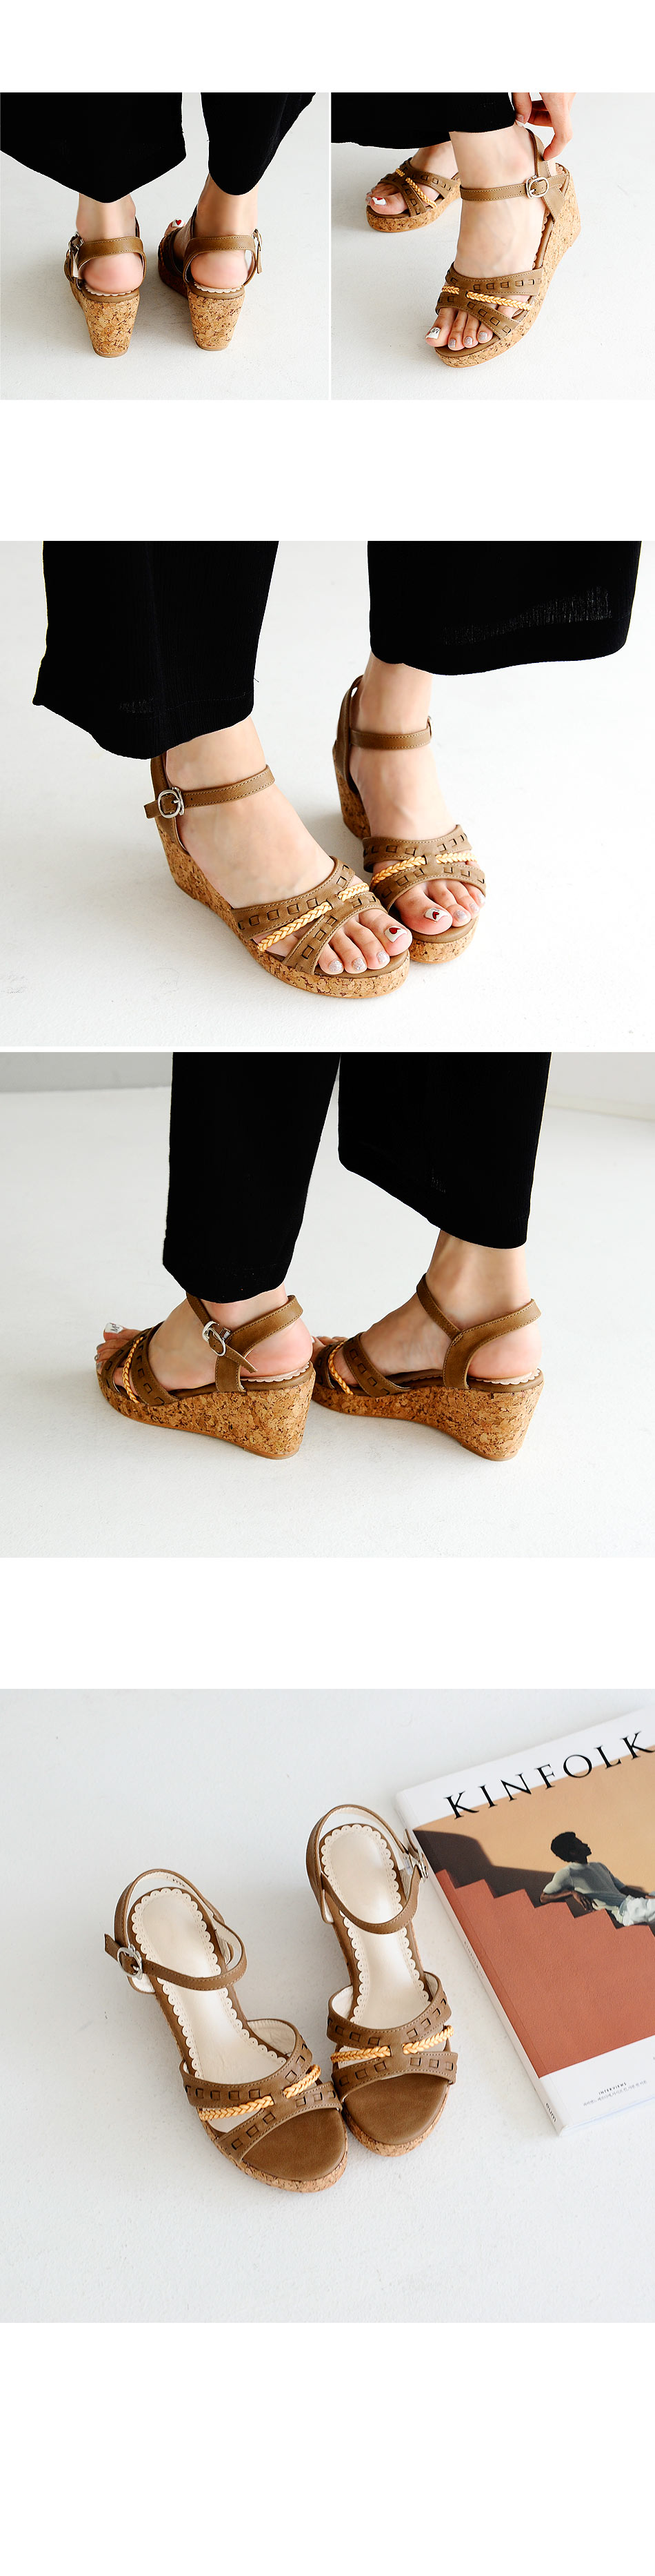 Kobellan Wedge strap sandals 7cm